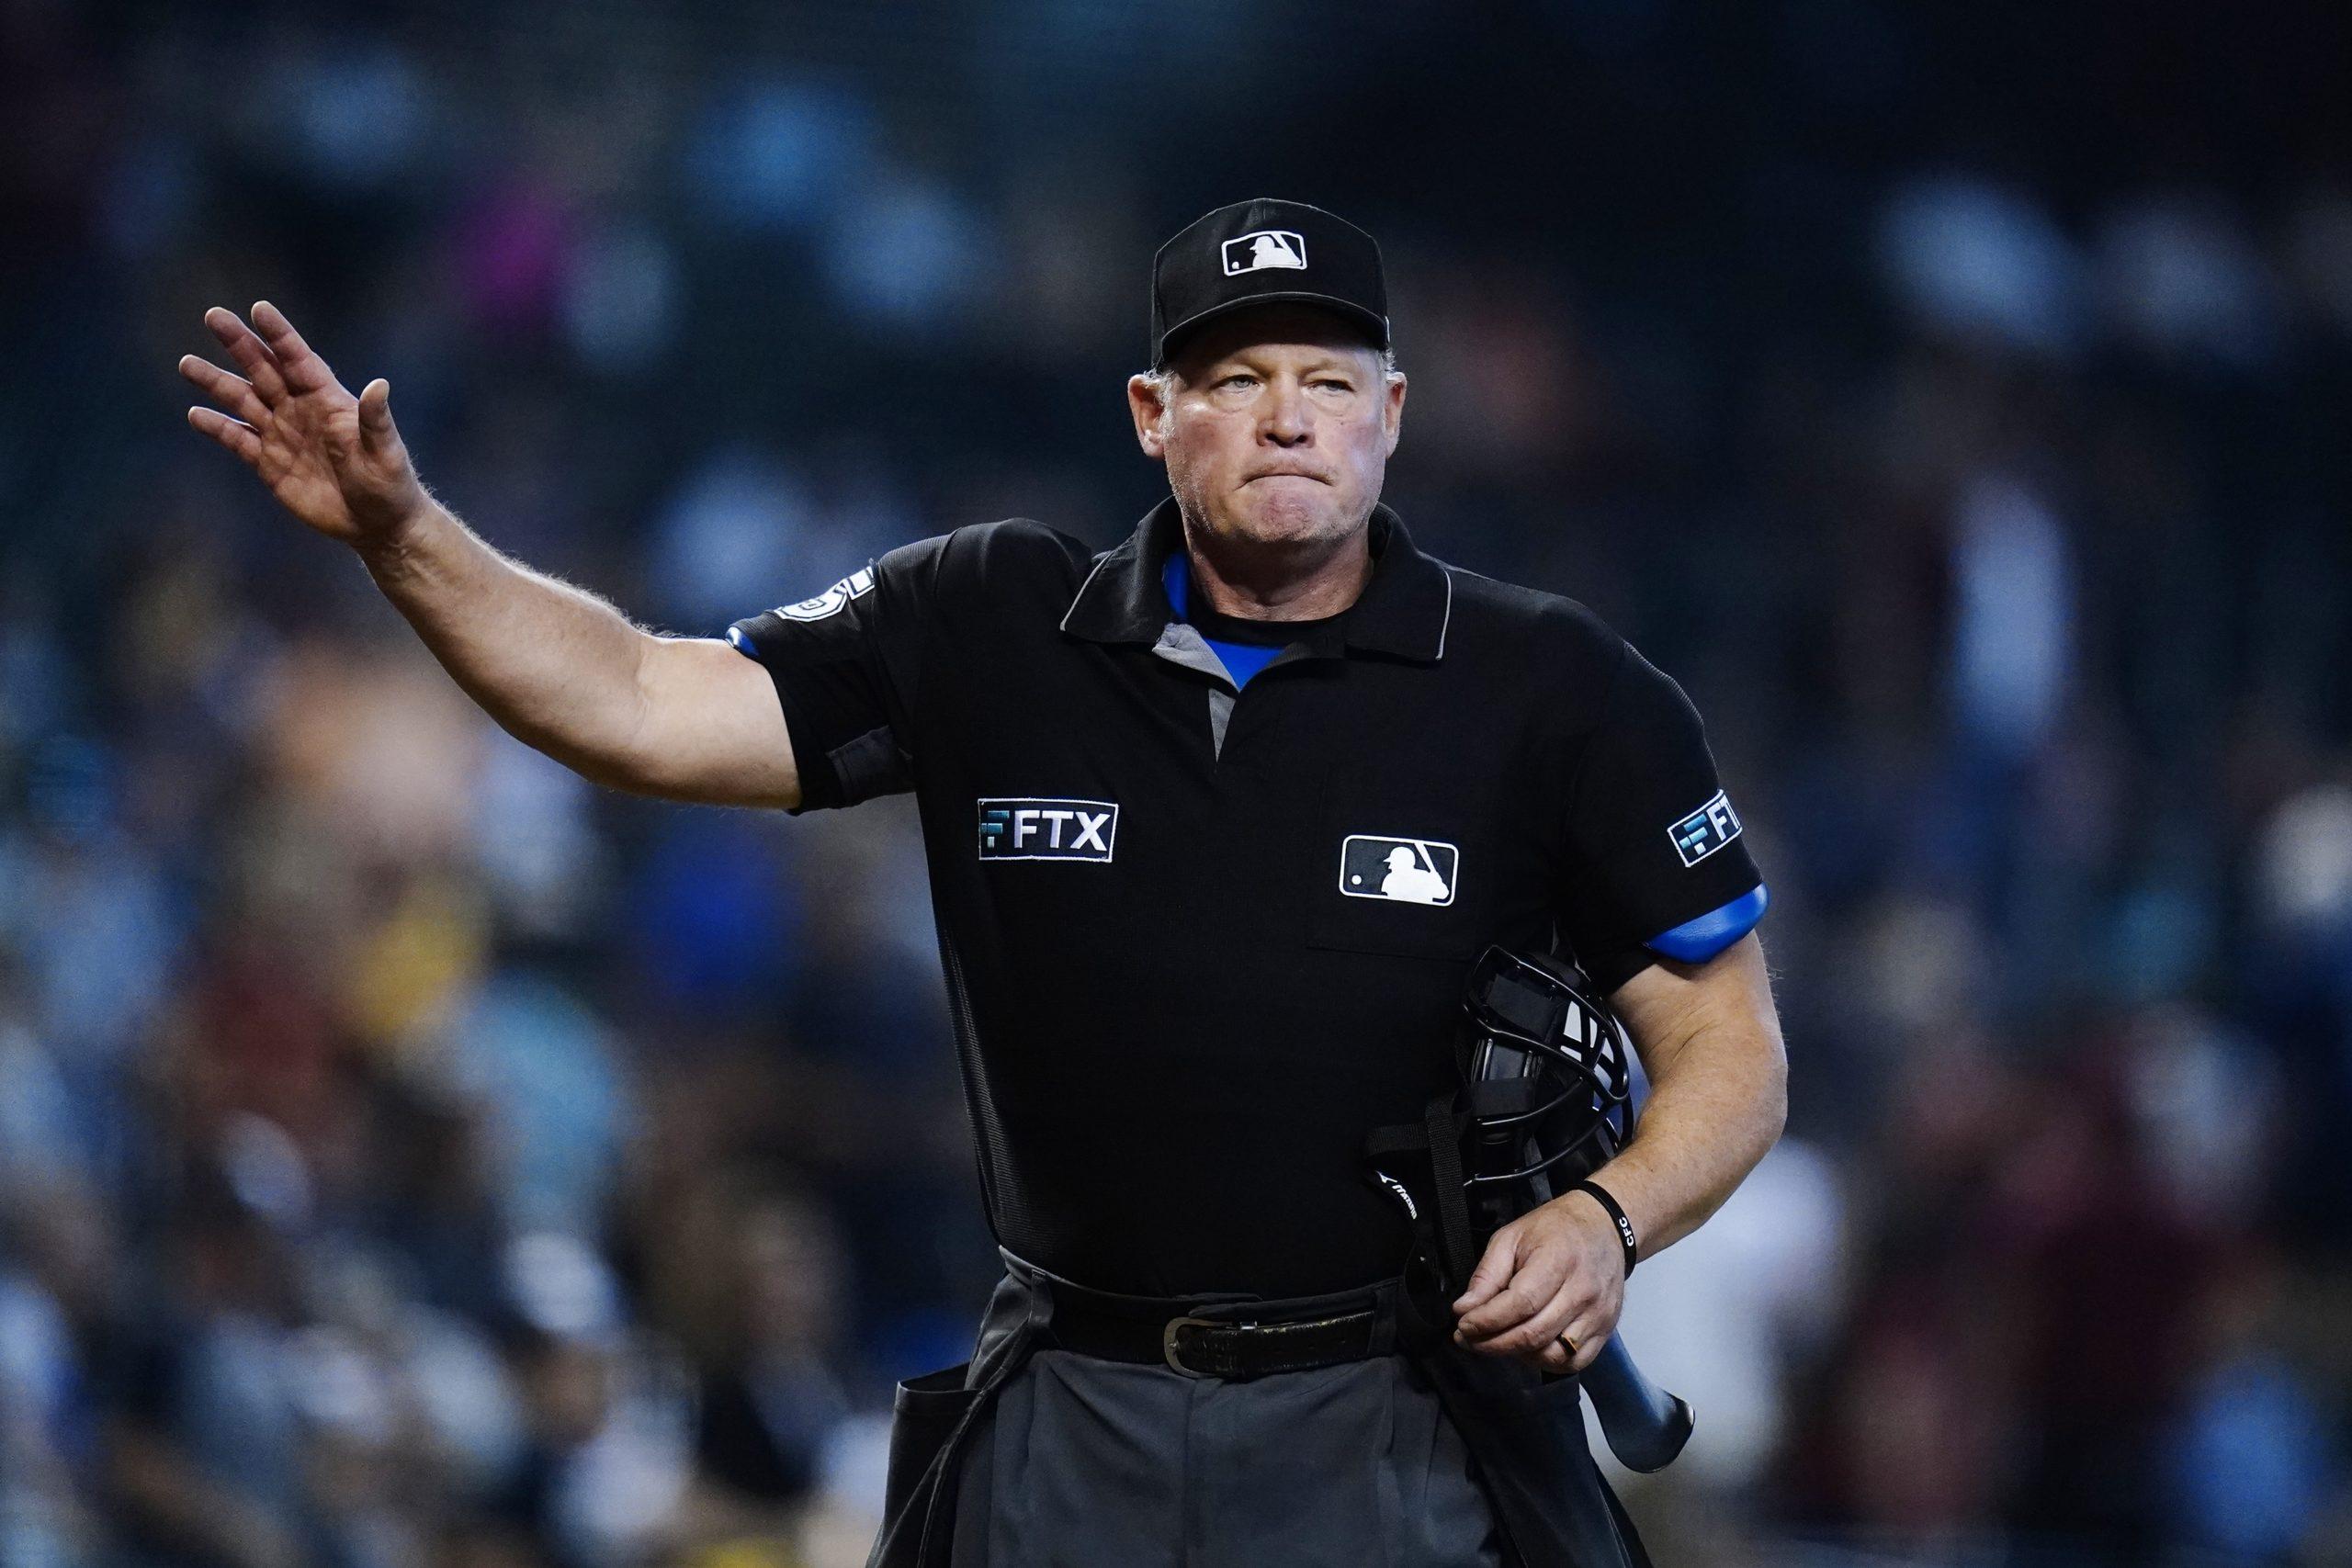 Umpire Ted Barrett